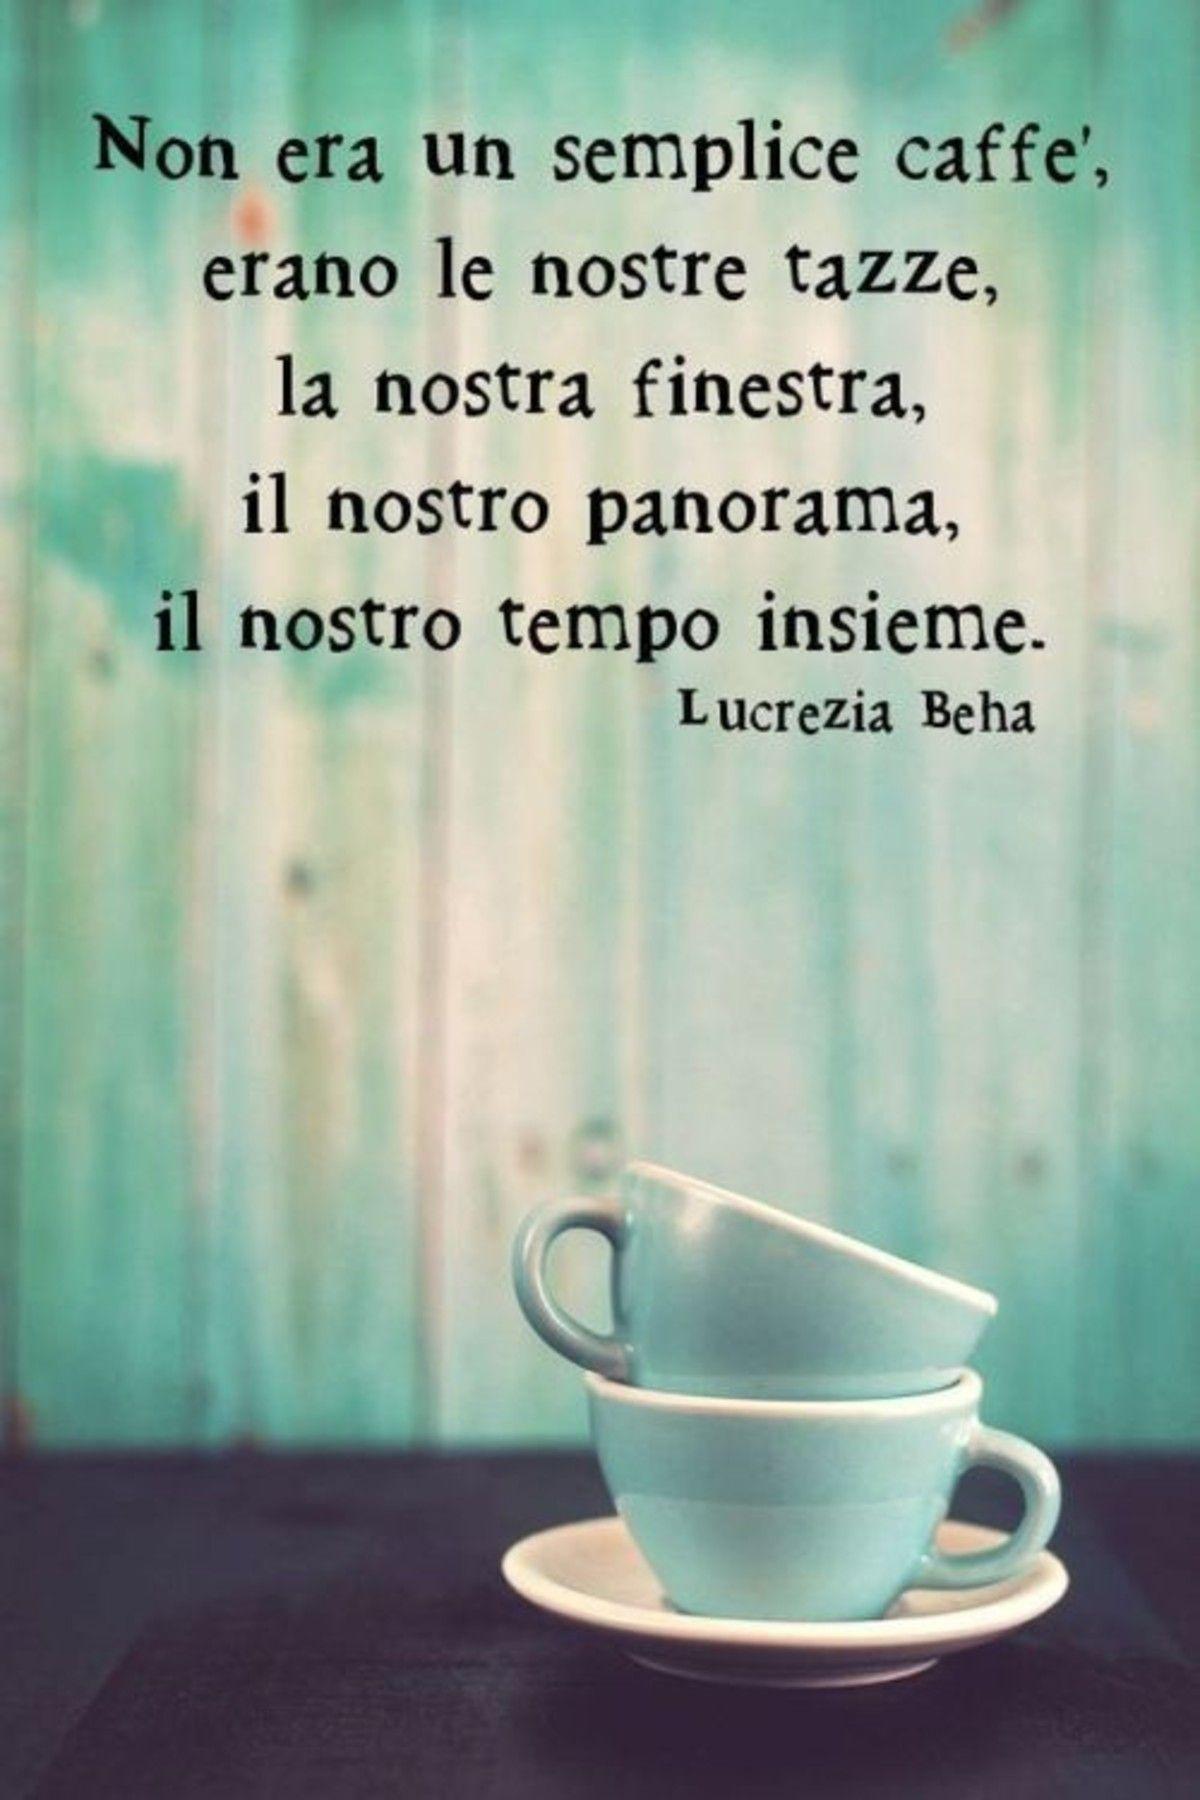 Belle Frasi Da Dedicare Citazioni Frasi Sul Caffe Frasi D Amore